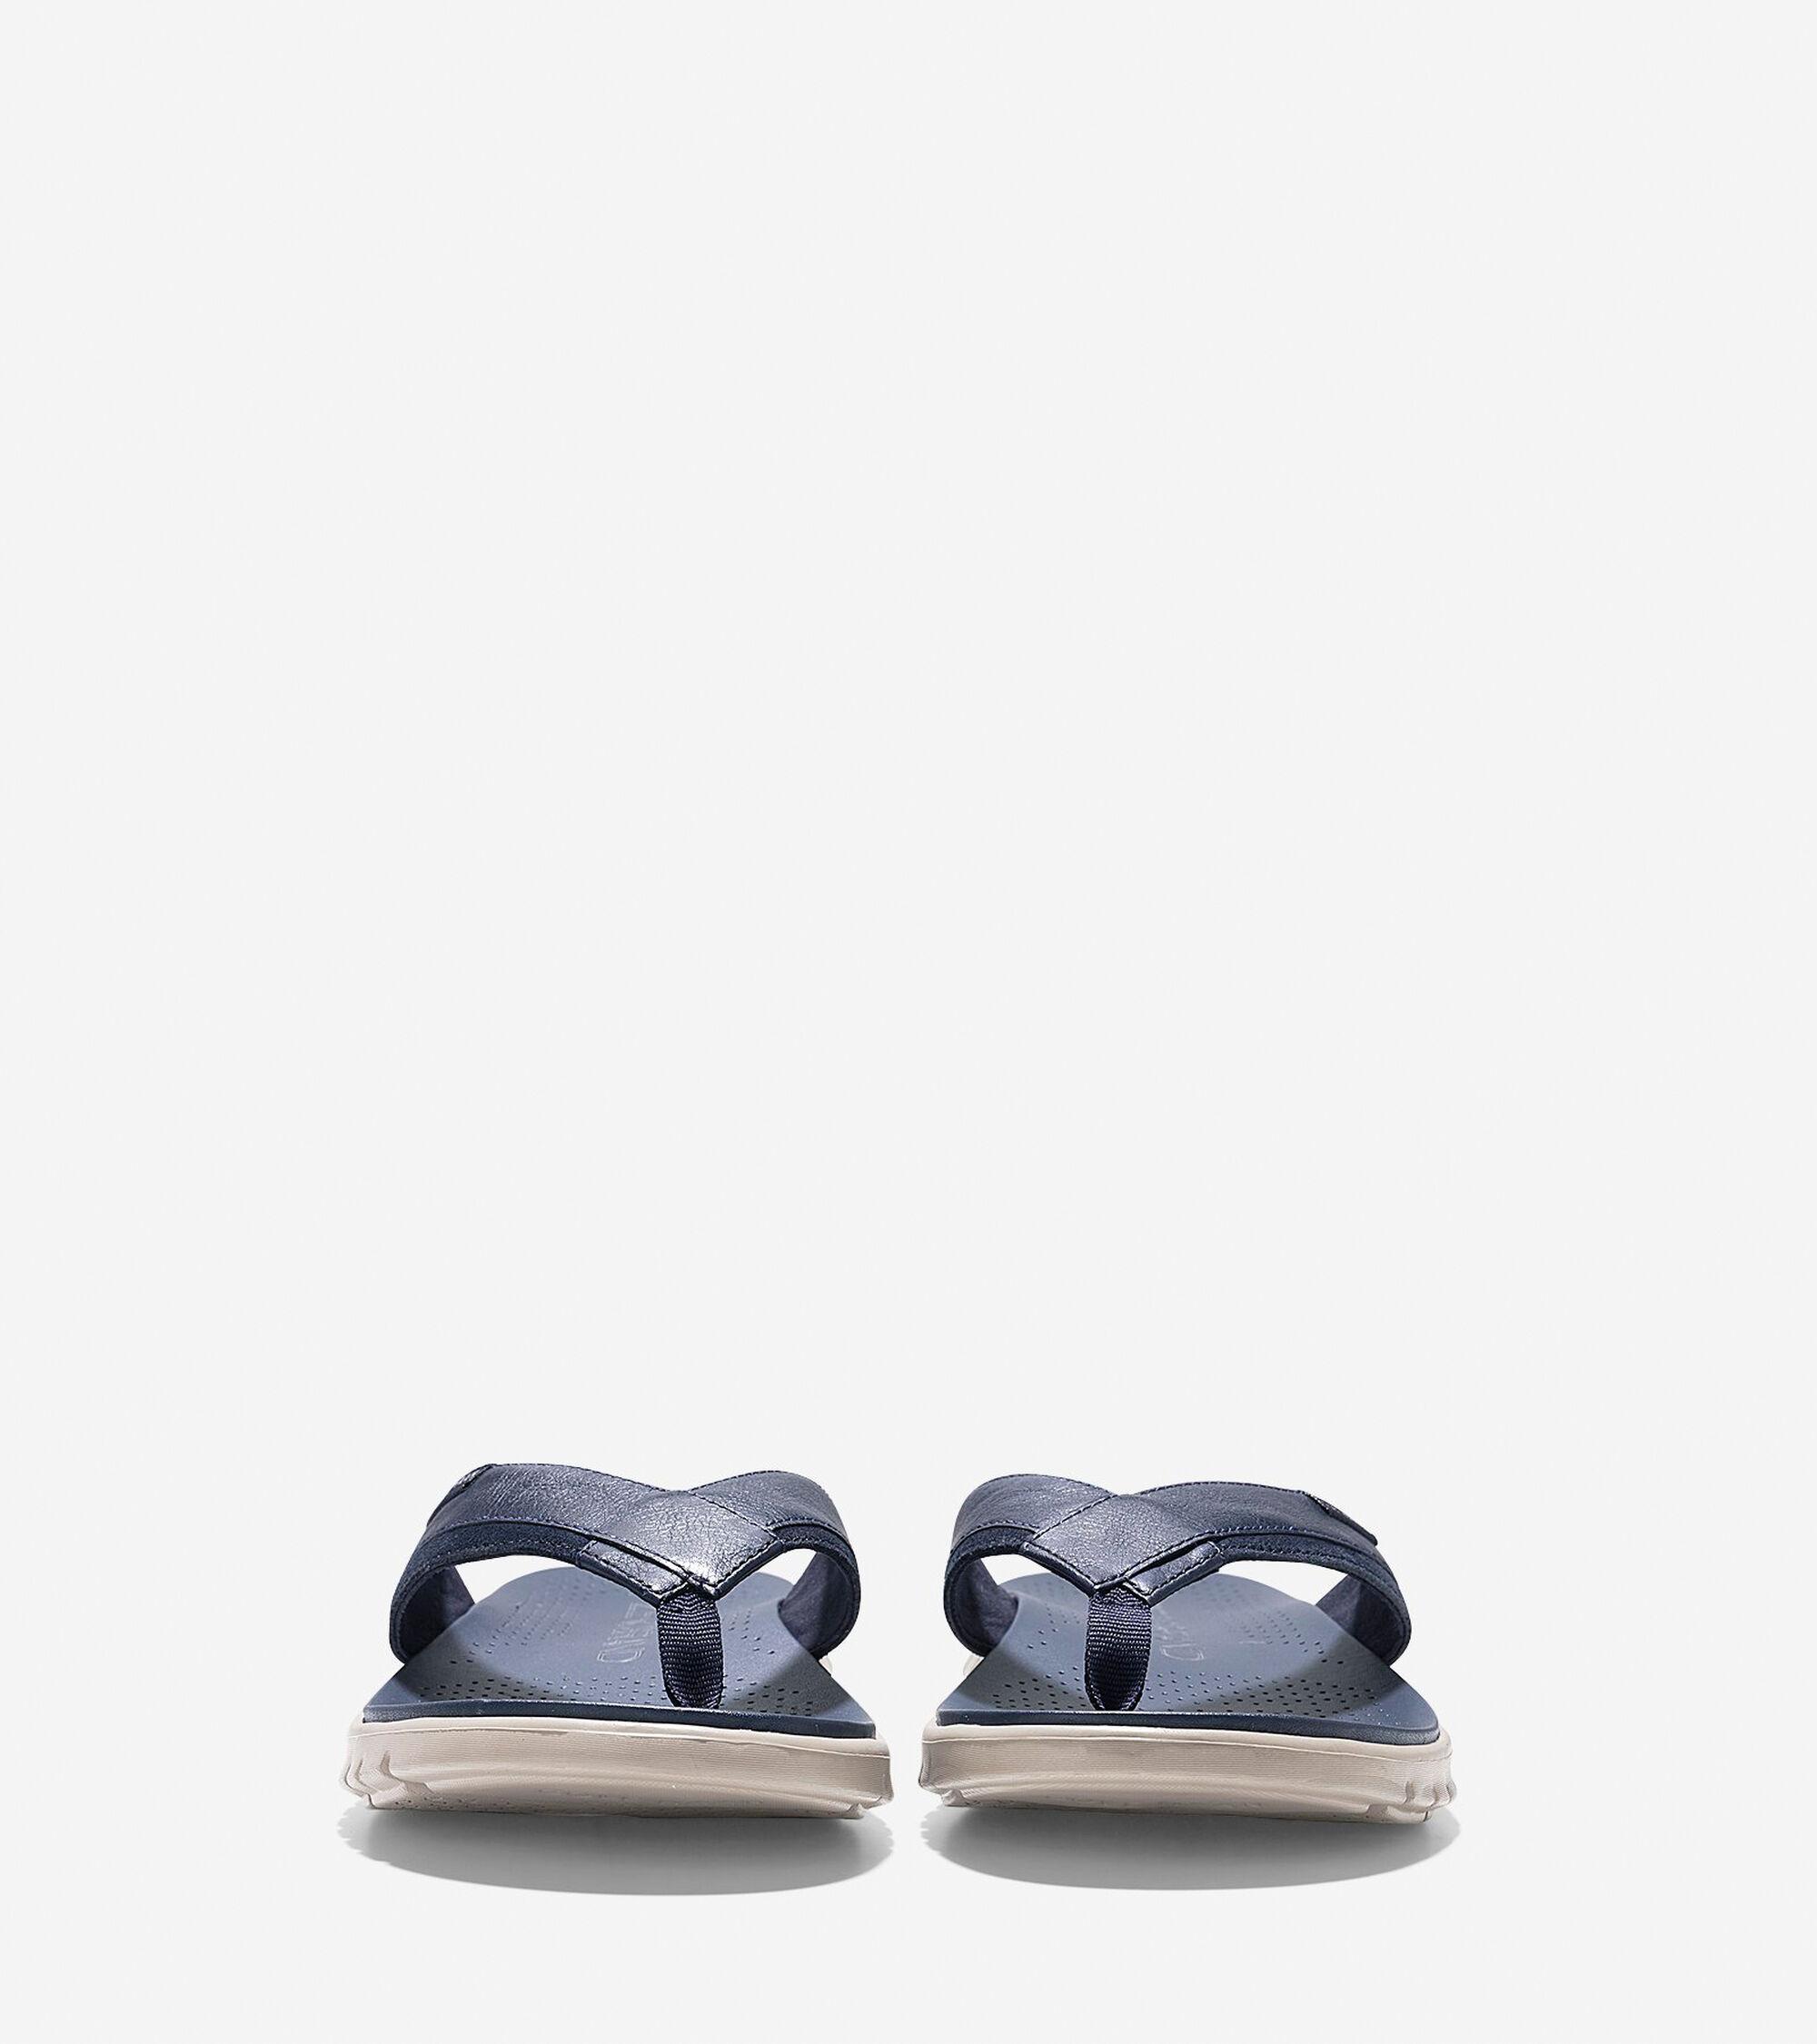 489b42e9df44 ZEROGRAND Fold Thong Sandals in Marine Blue